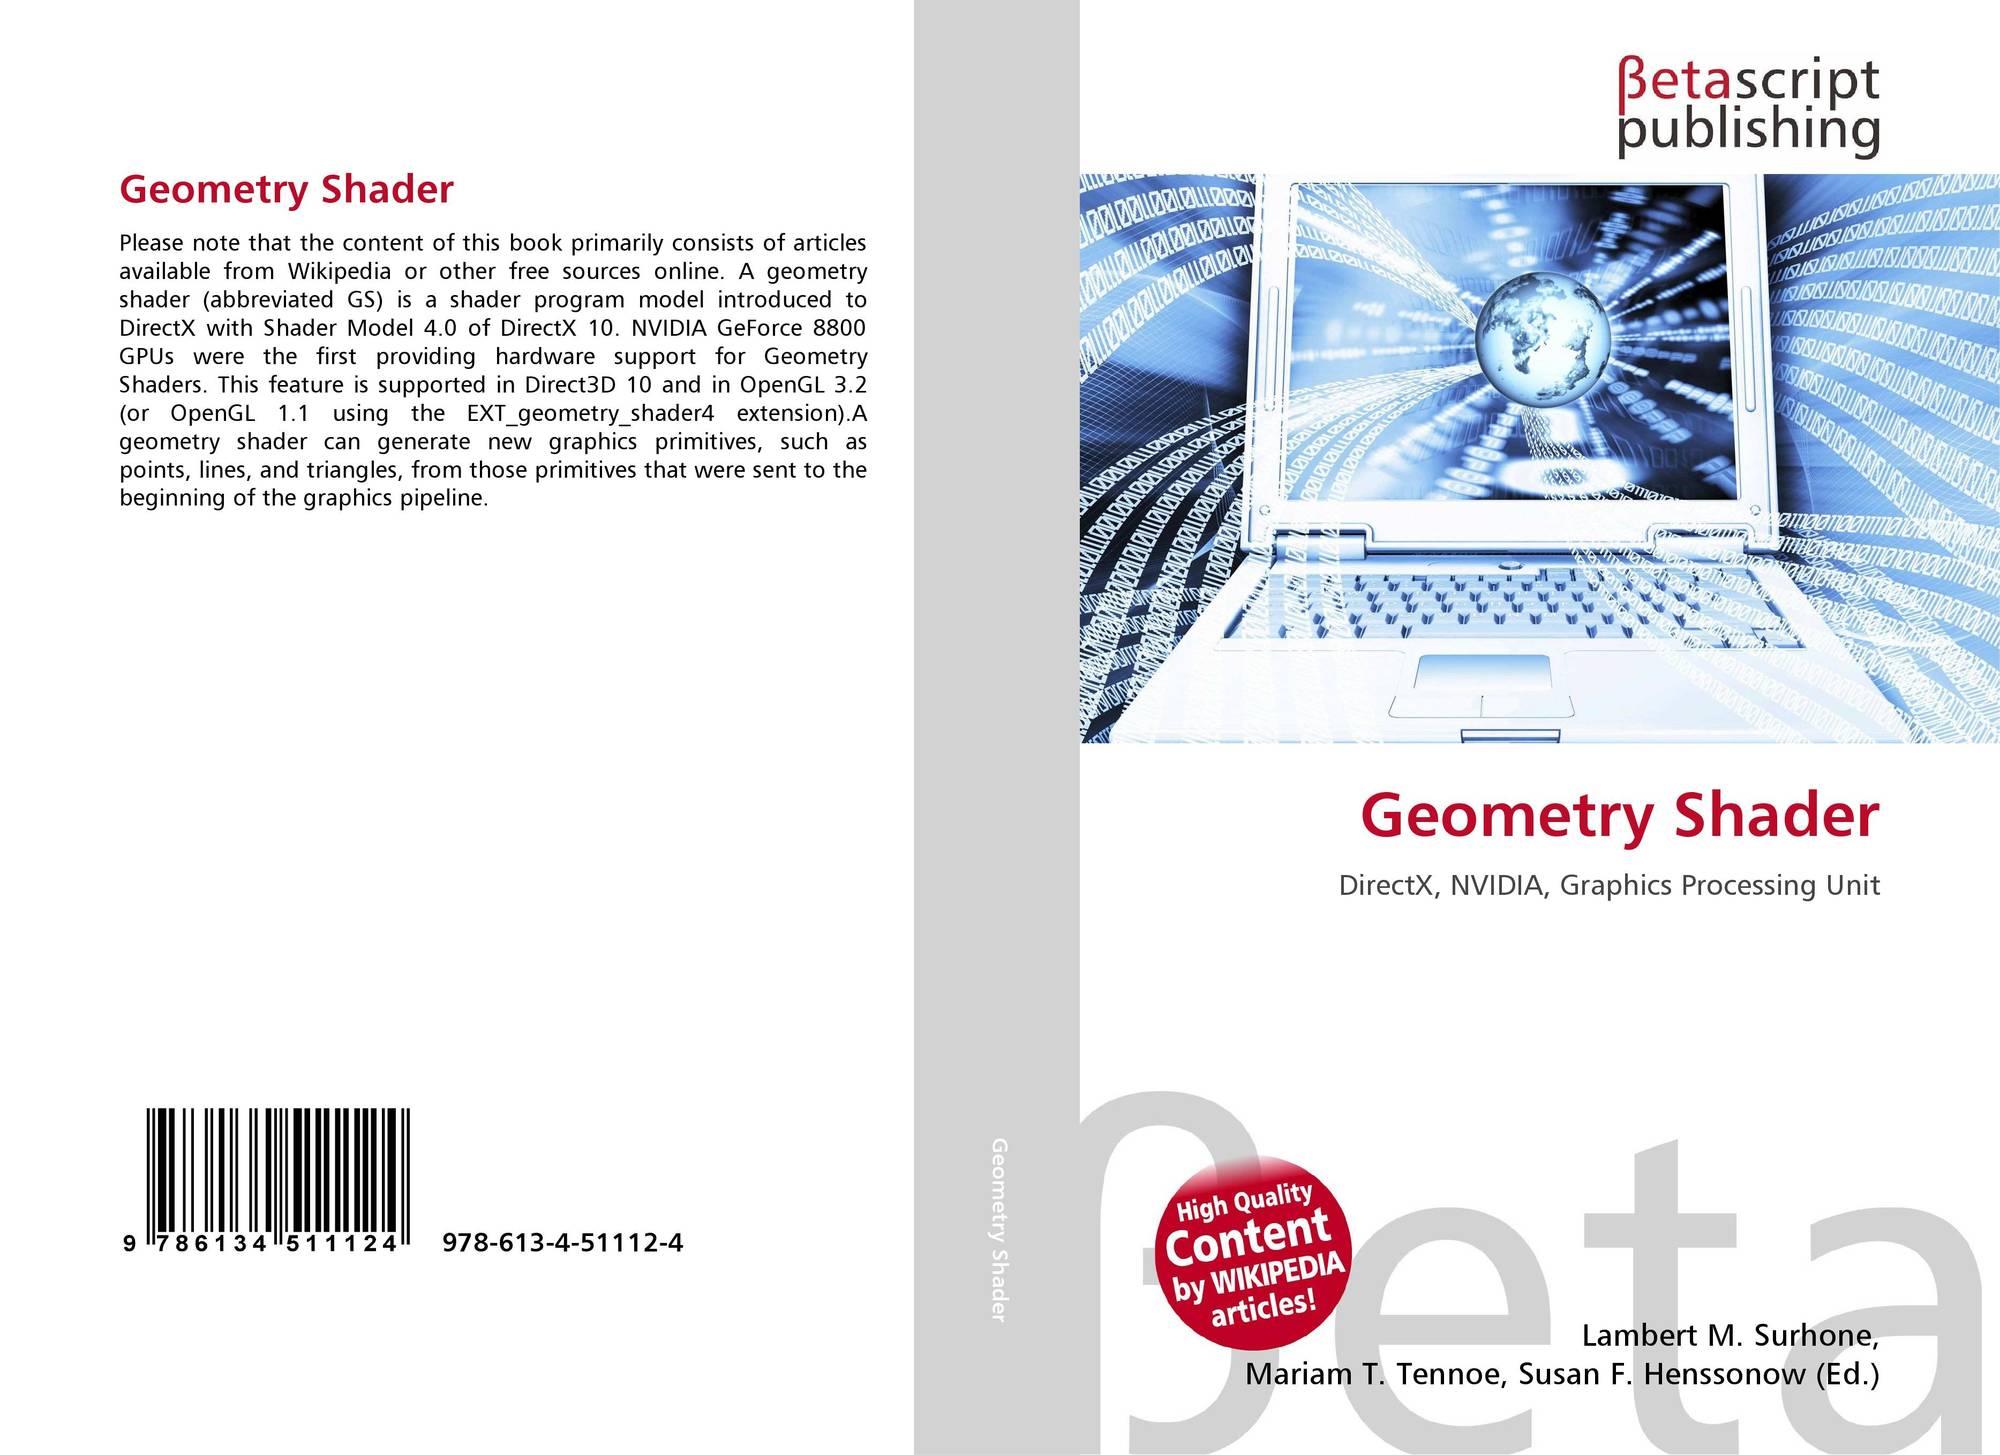 Geometry Shader, 978-613-4-51112-4, 6134511129 ,9786134511124